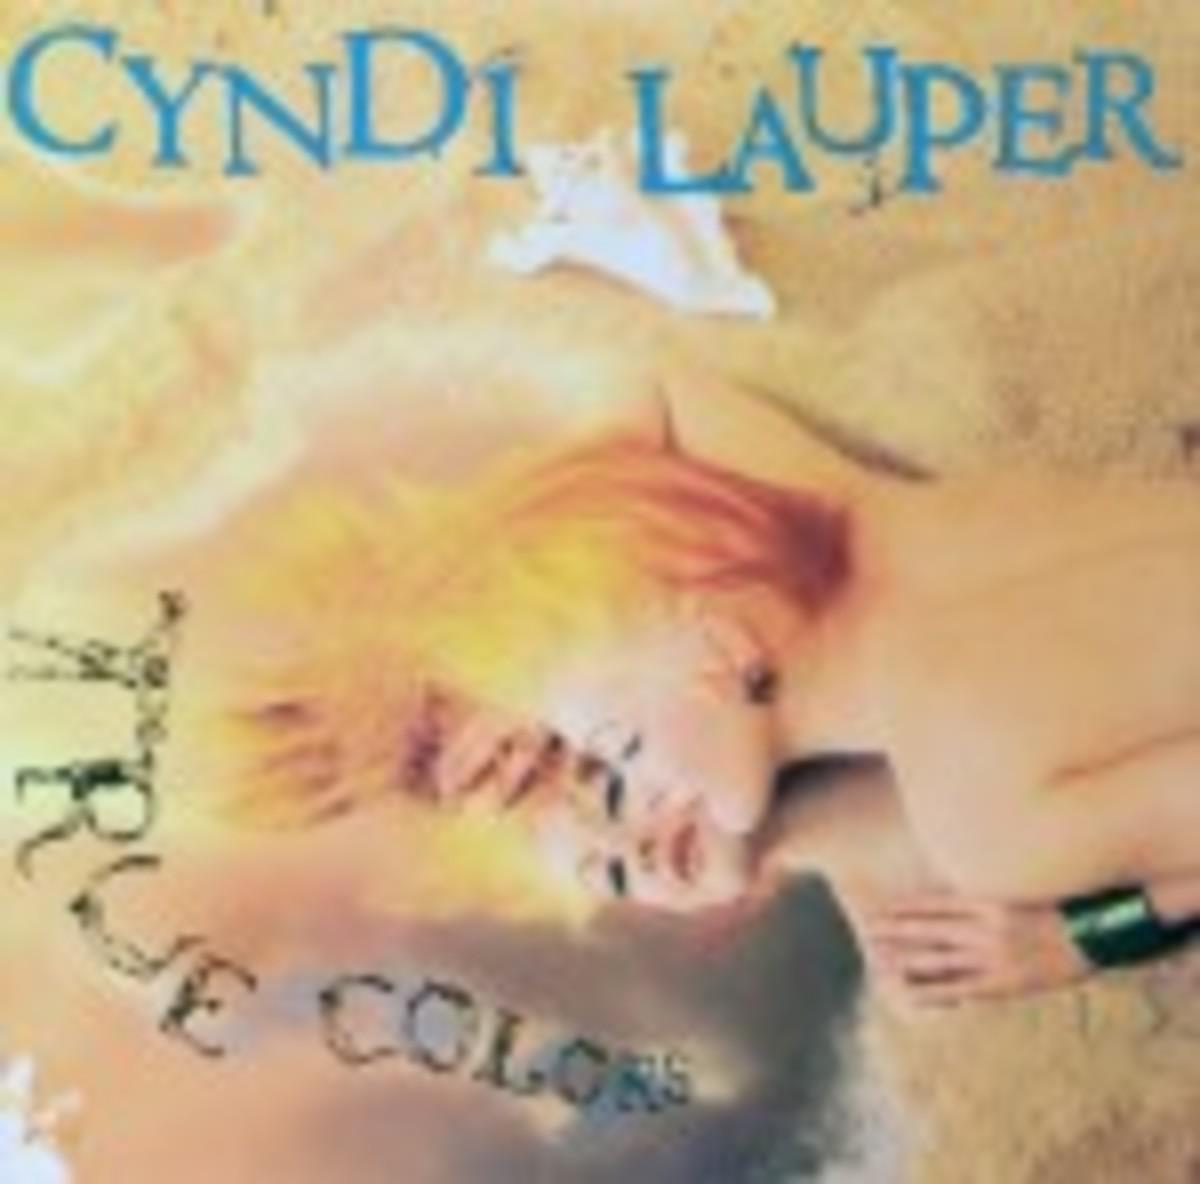 cyndi-true colors